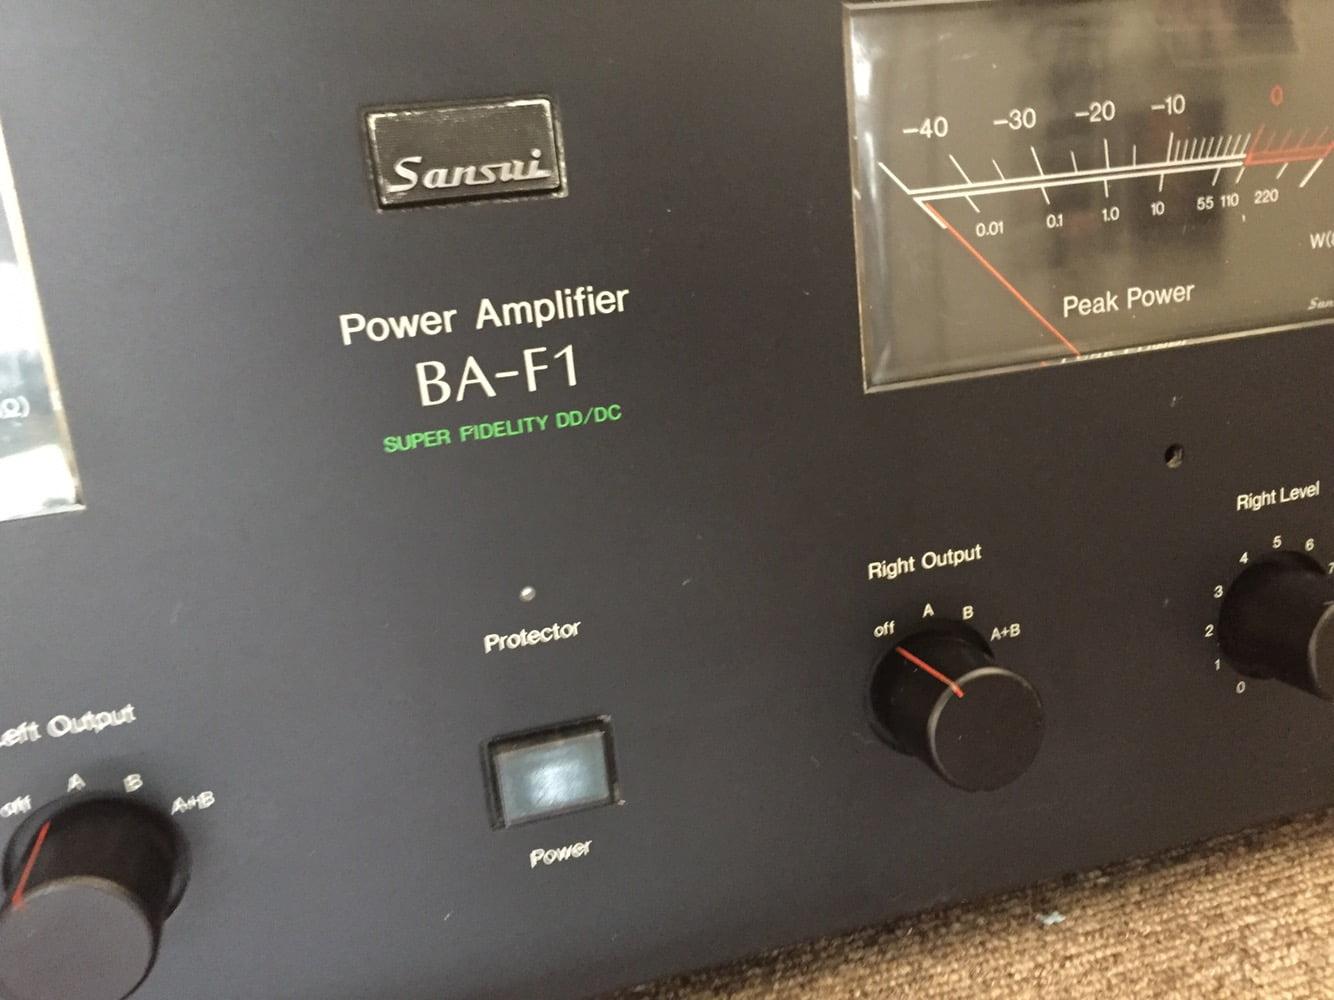 Sansui BA-F1 Power Amplifier Restoration Update